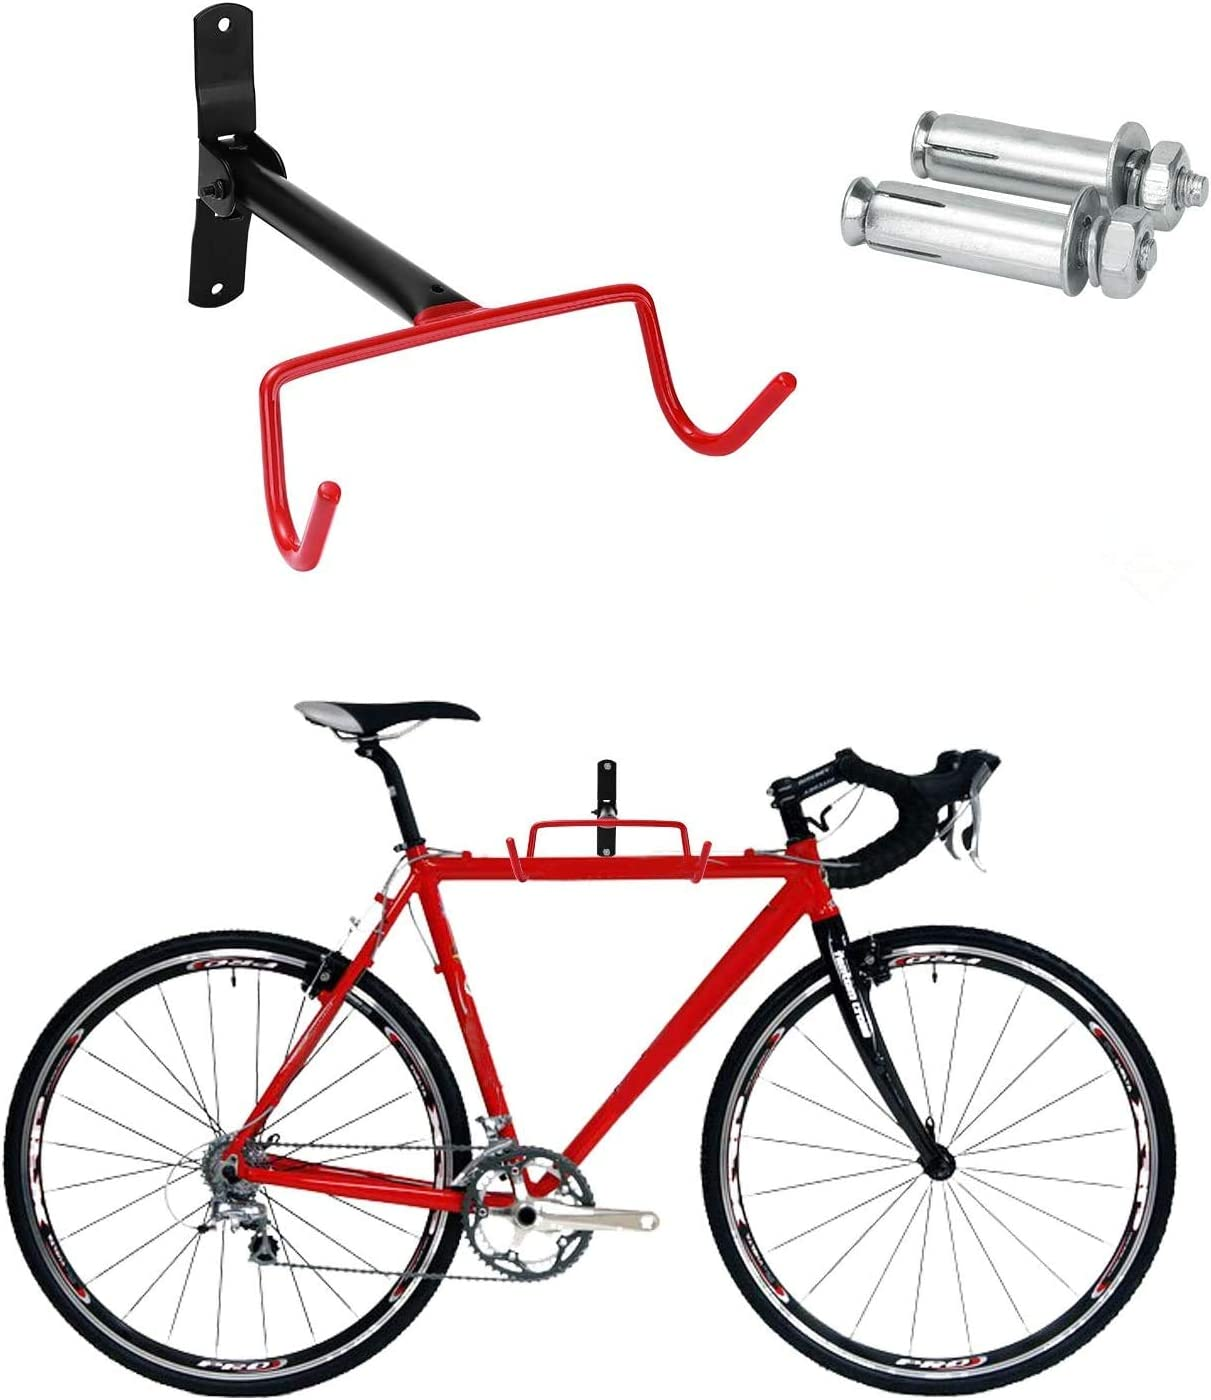 10 Pcs Bicycle Storage Hooks Wall Mount Bike Cycle Hanger Hanging Cycle Brackets